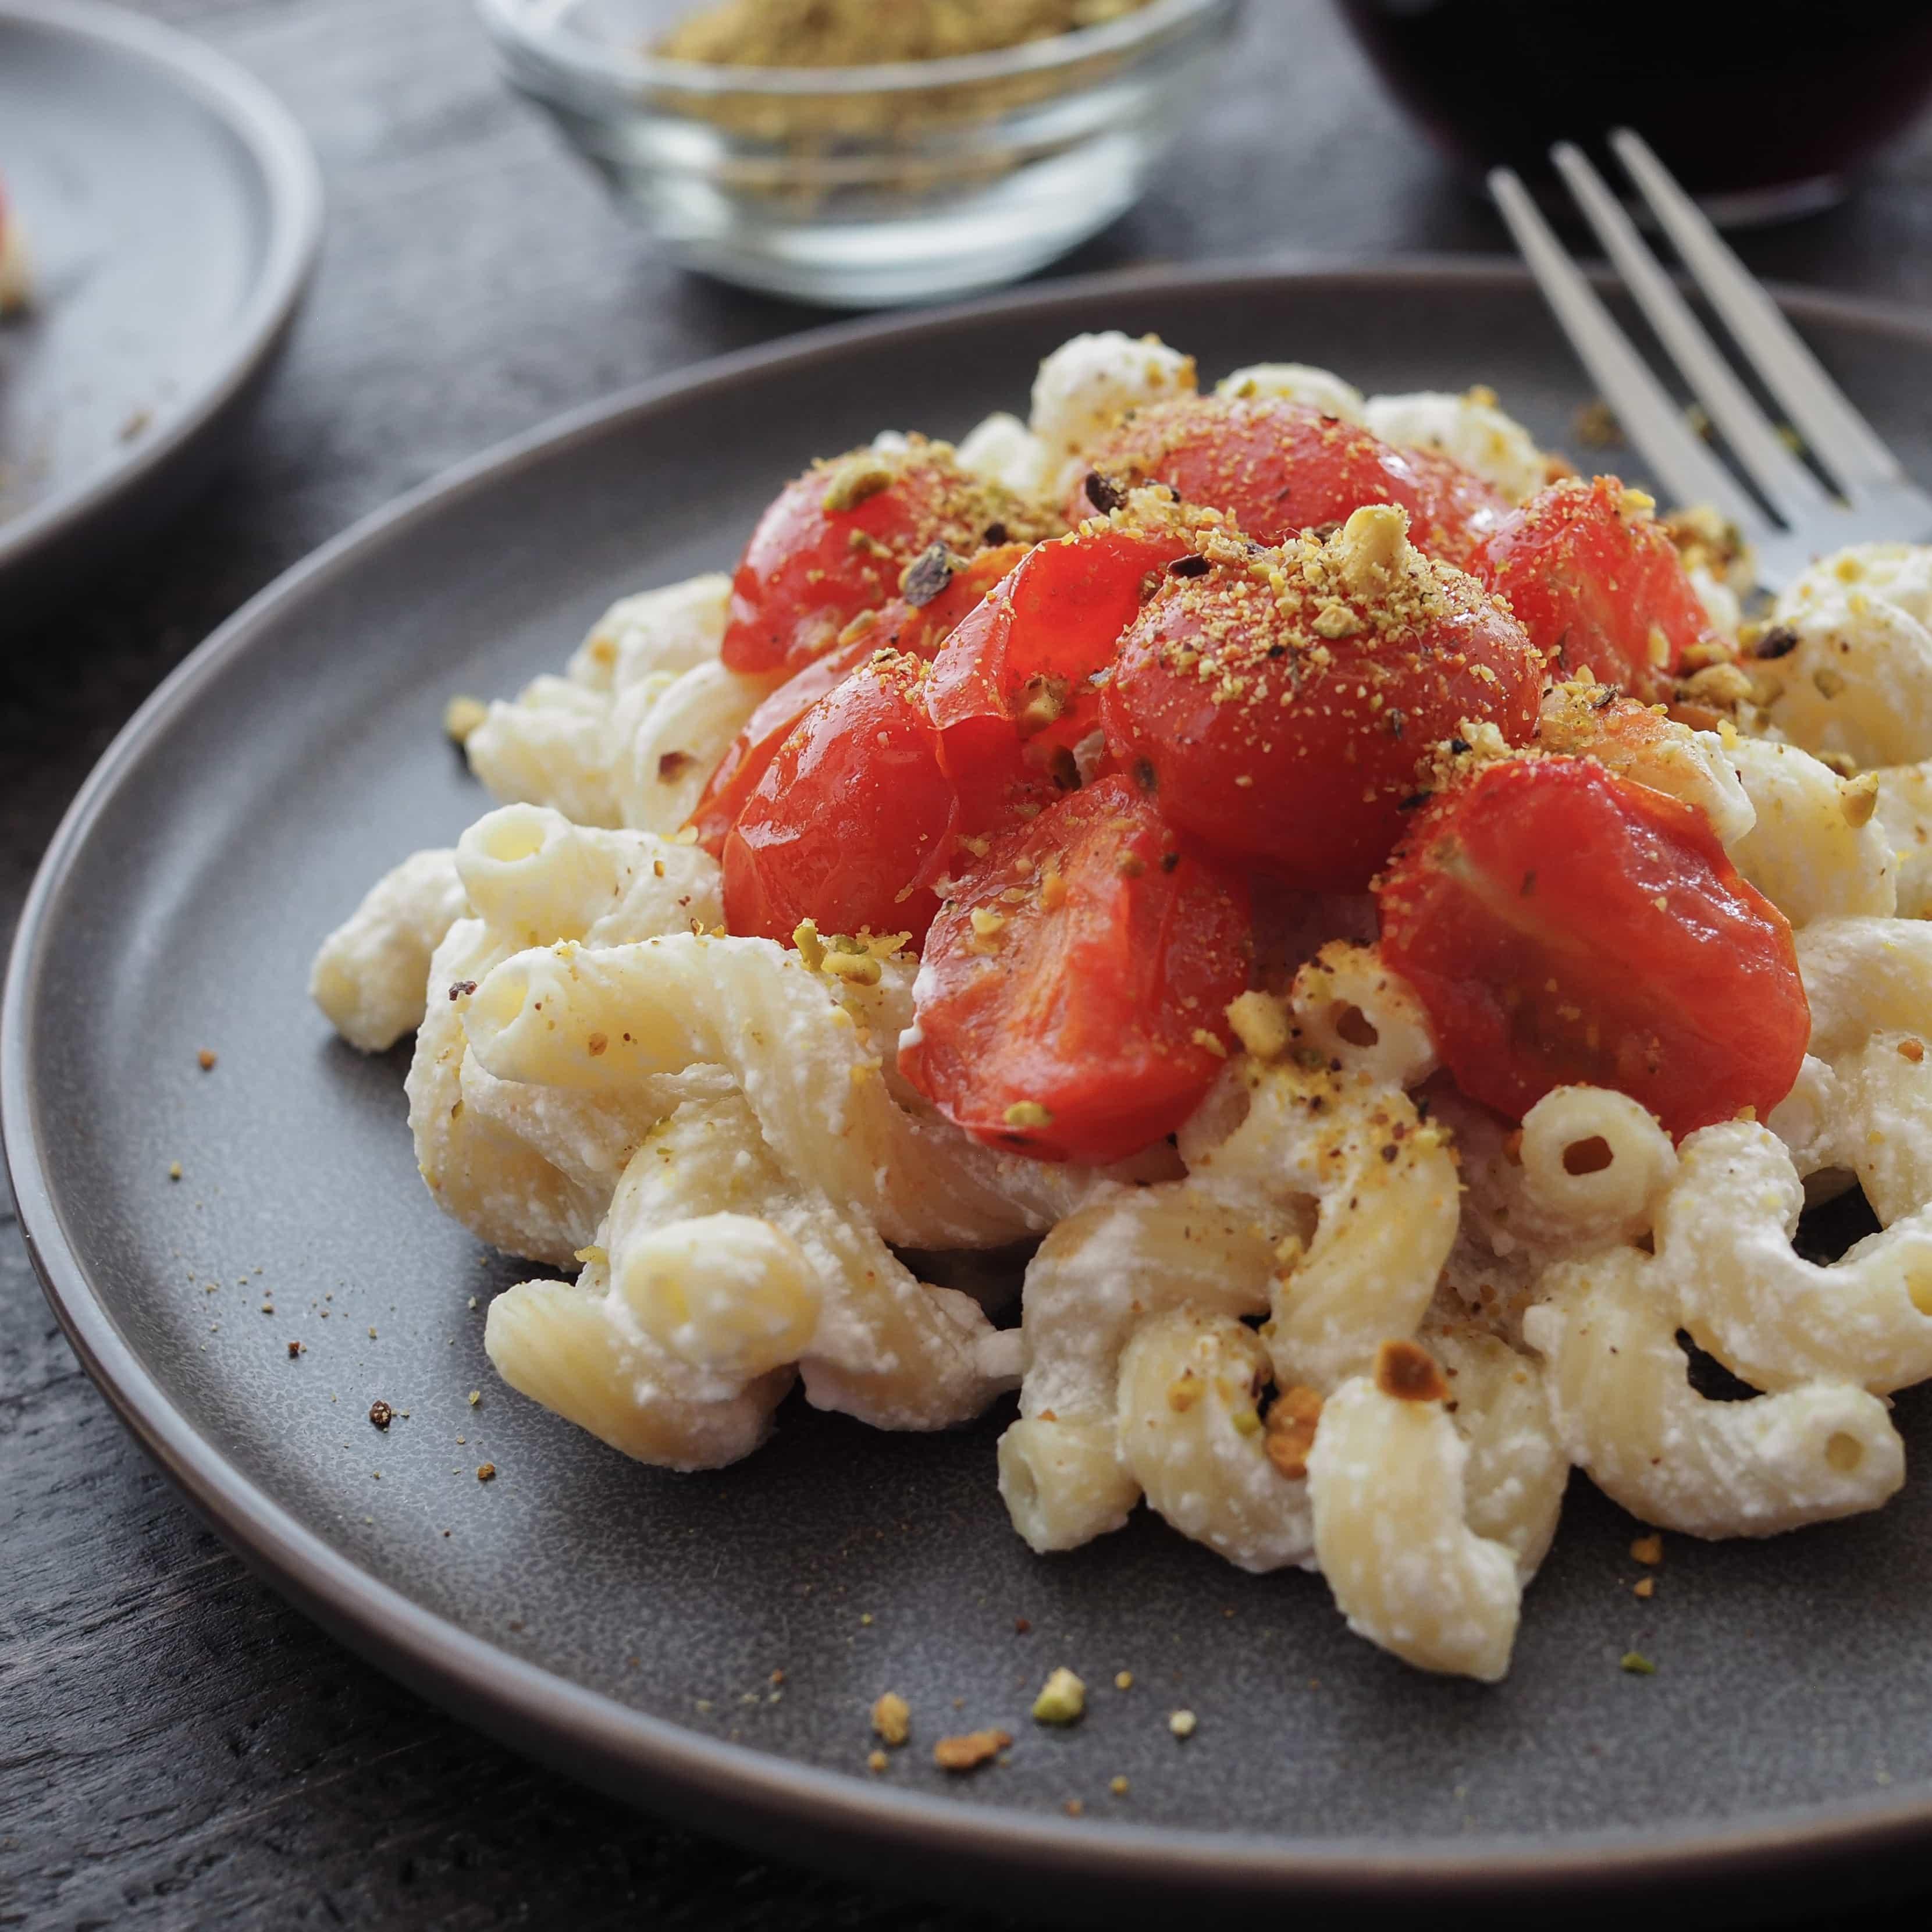 Lemon Pistachio Cavatappi with Pan Roasted Tomatoes